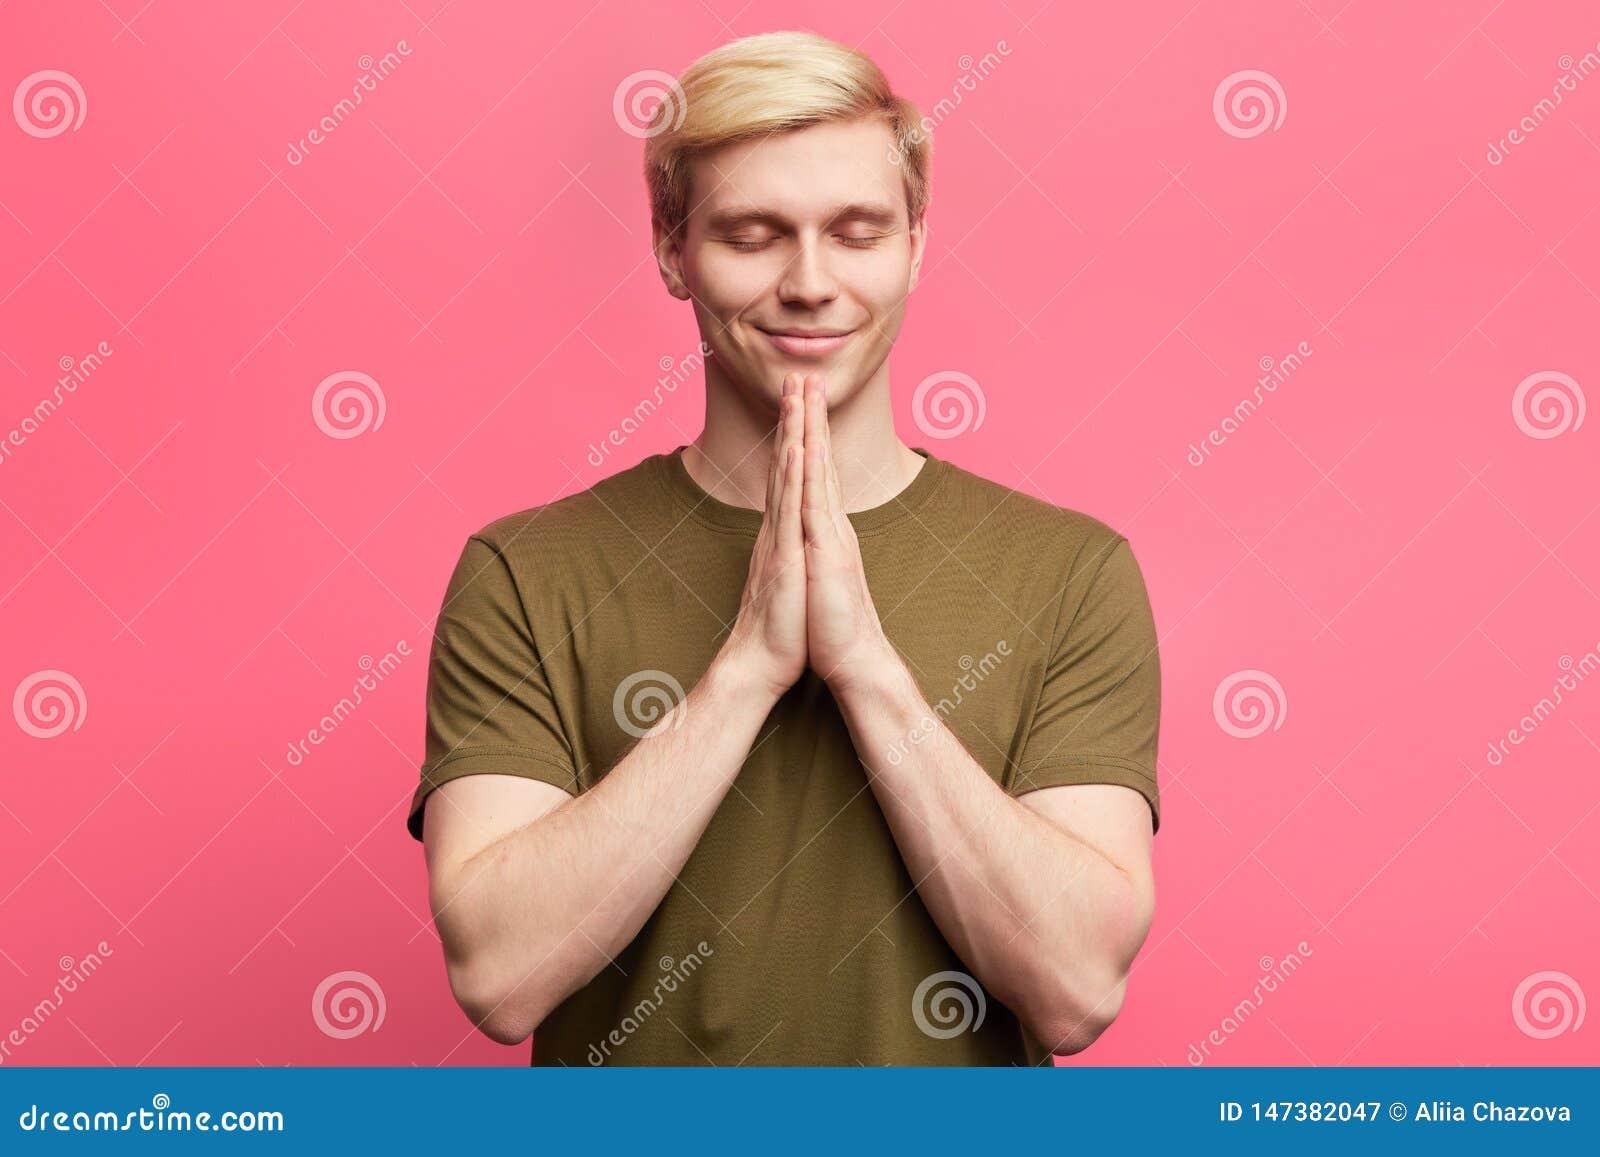 Young blonde guy puts hands together in prayer or meditation